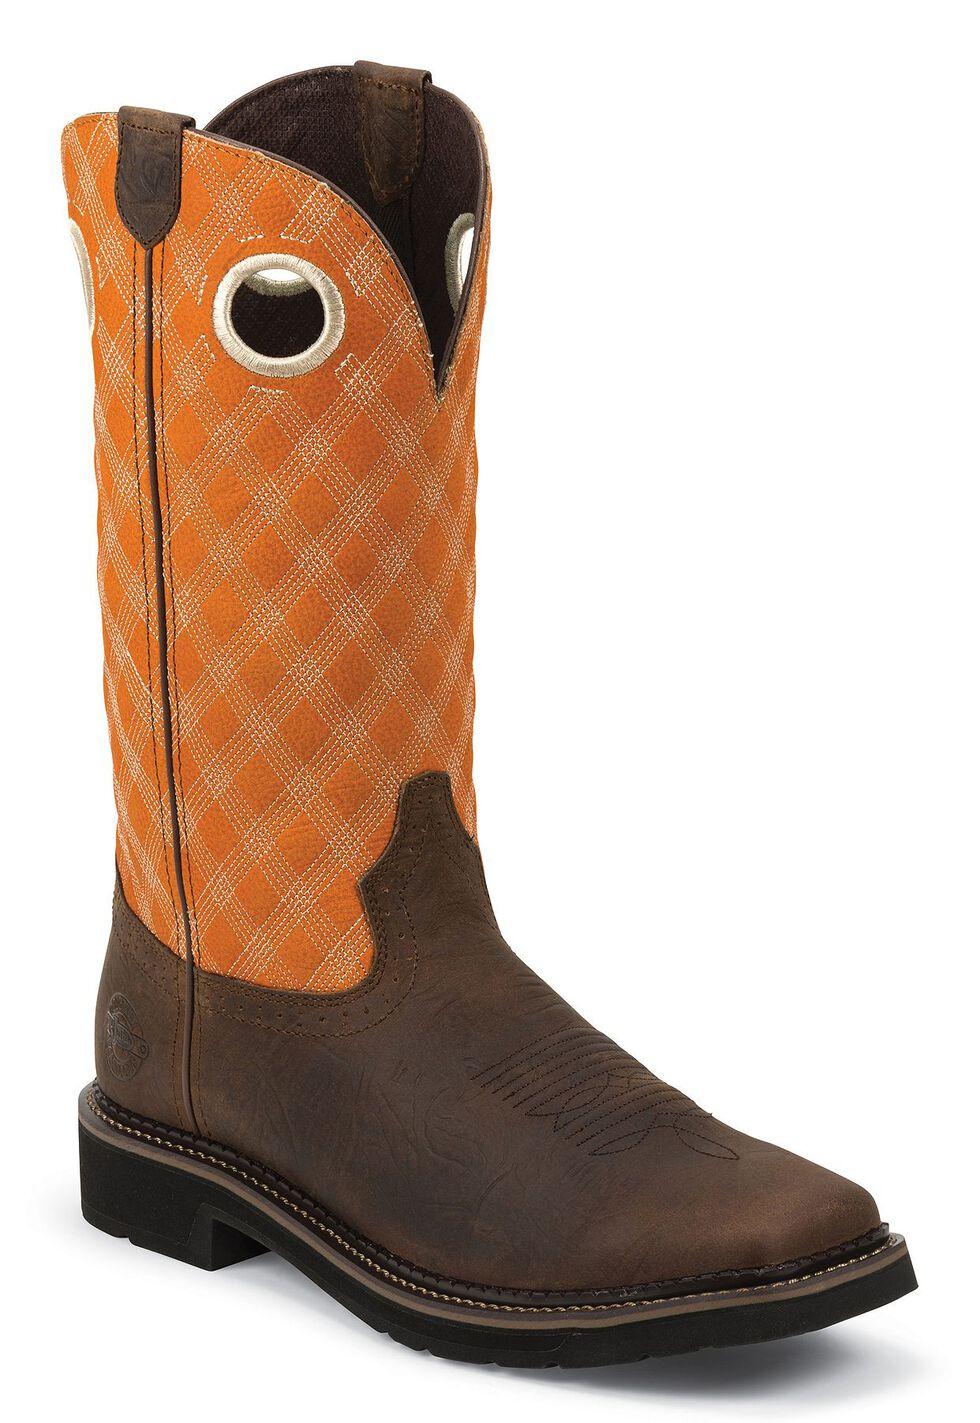 Justin Men's Stampede Negotiator Work Boots - Composite Toe, Brown, hi-res